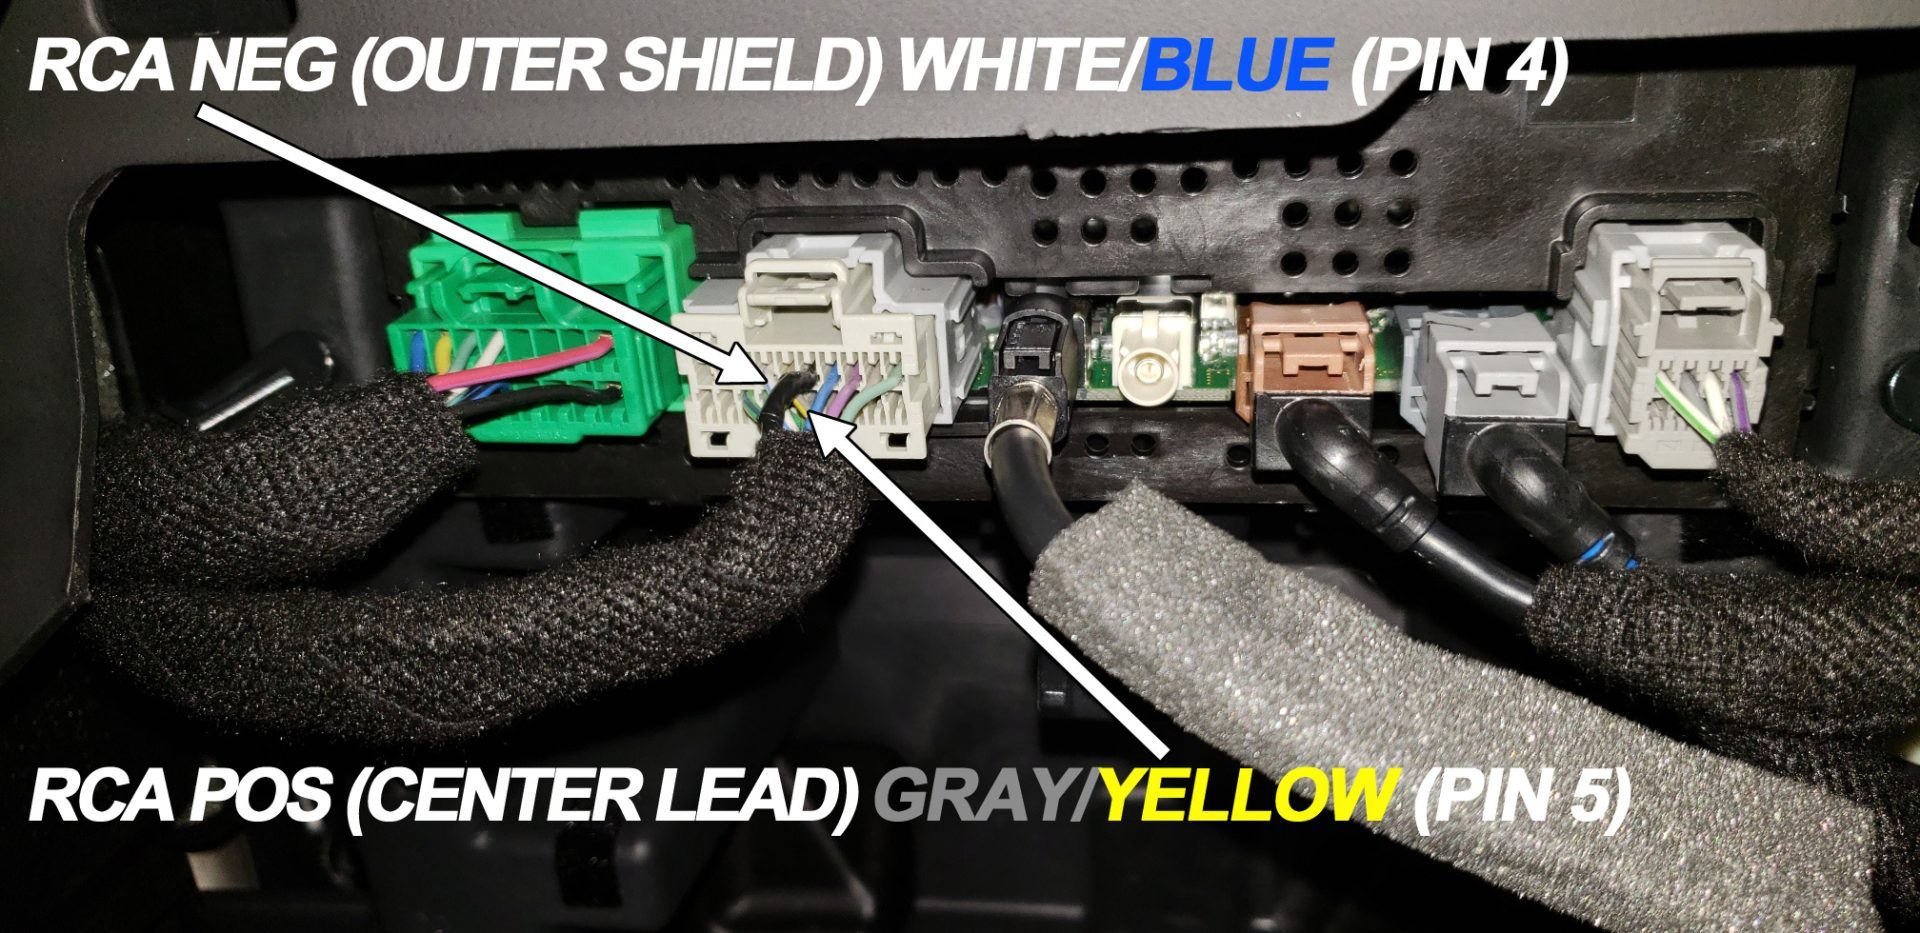 2016 Chevy Silverado 3500Hd Backup Camera Wiring Diagram from www.adcmobile.com